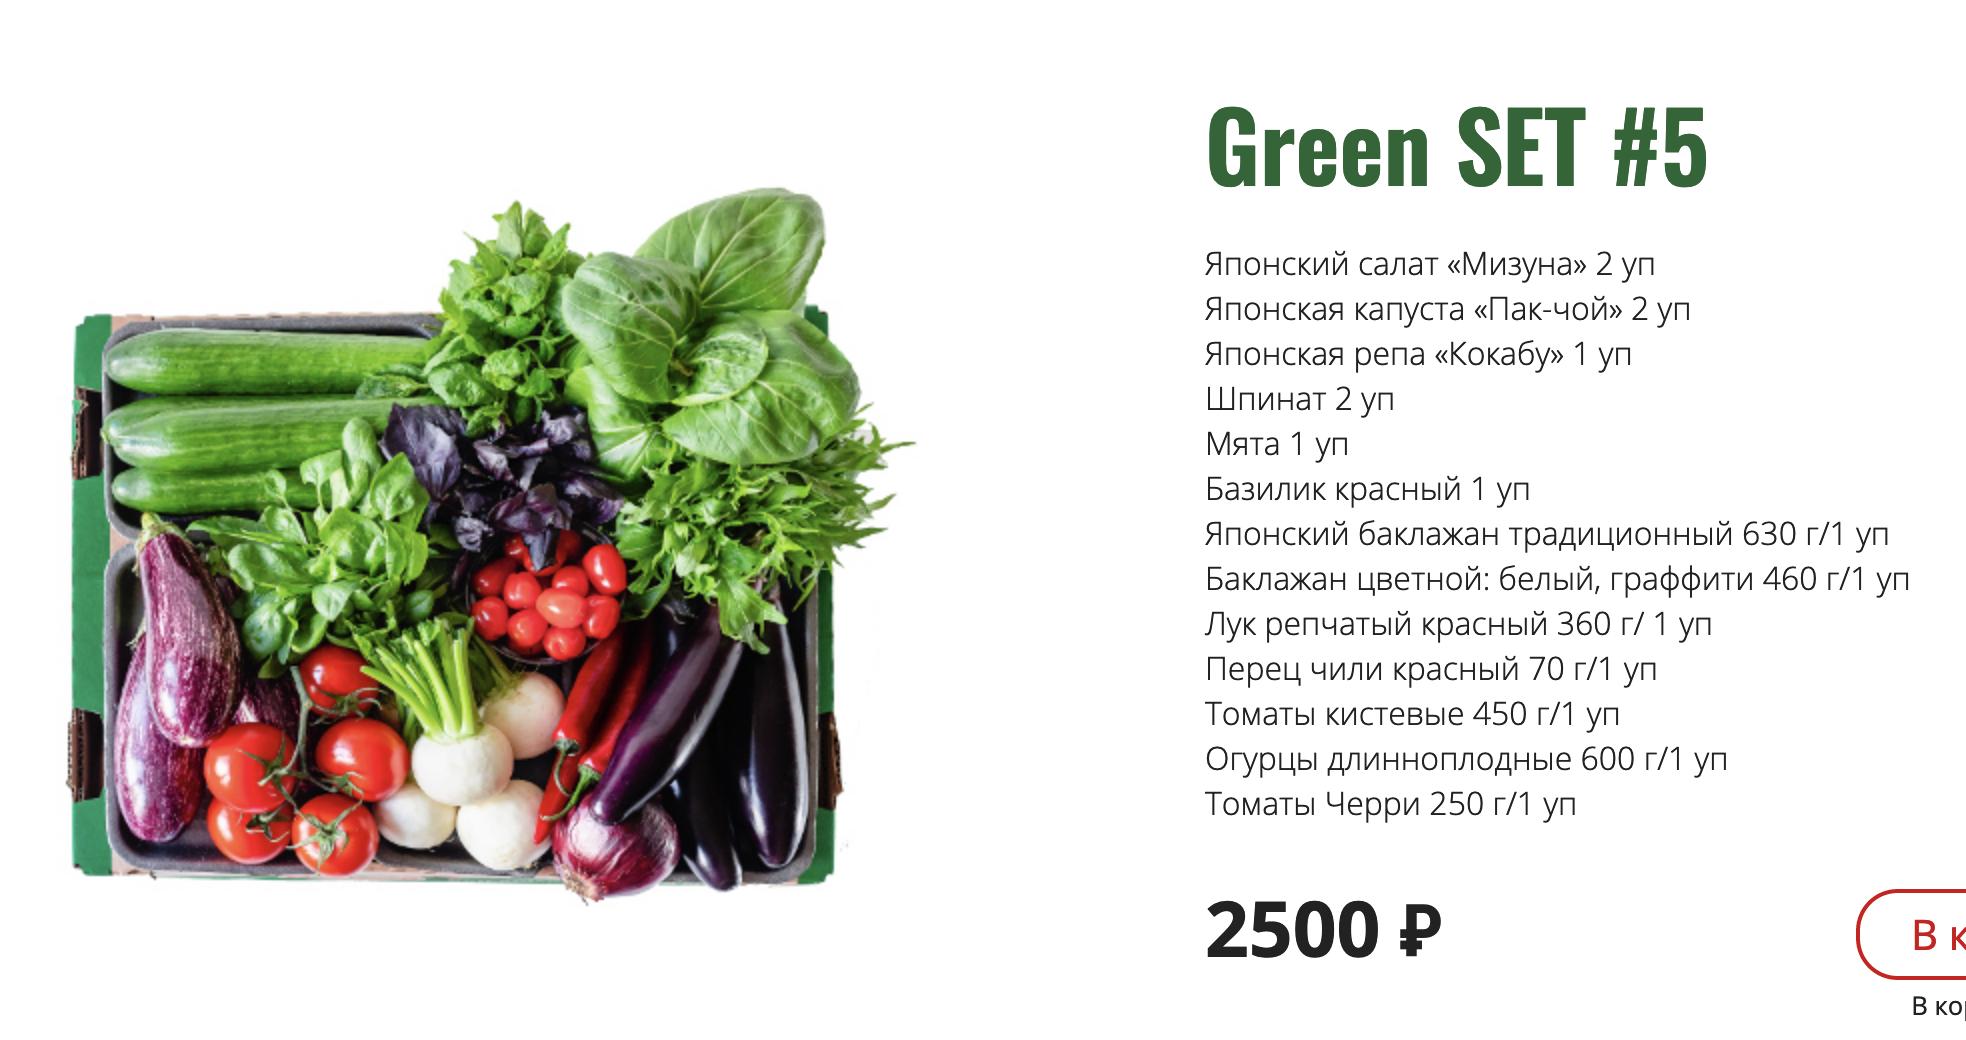 https://green-set.ru/